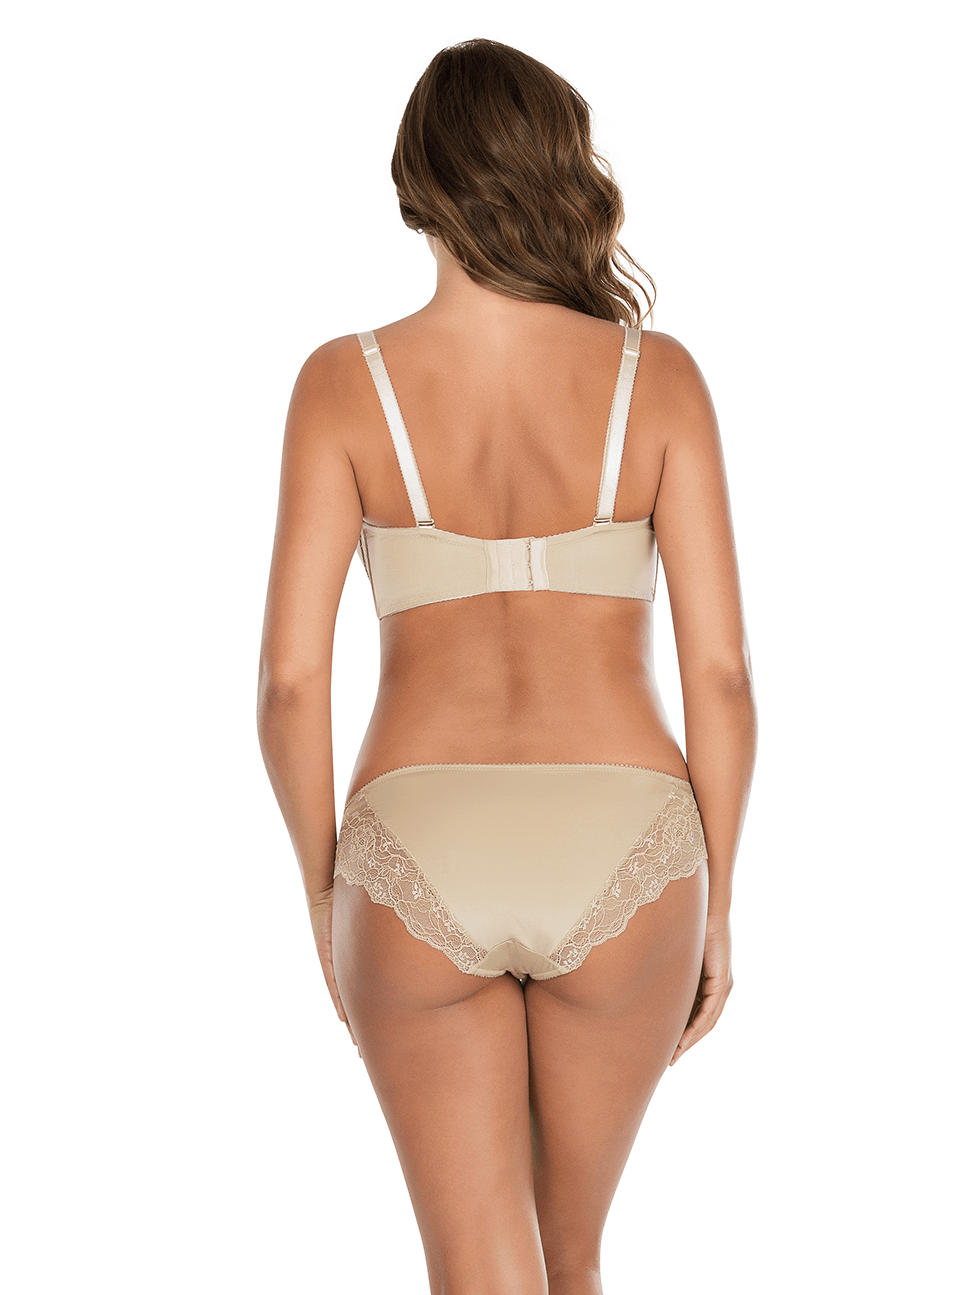 Elissa ContourUnderwireBraP5011 BikiniP5013 ENude Back - Elissa Strappless Bra - European Nude - P5011